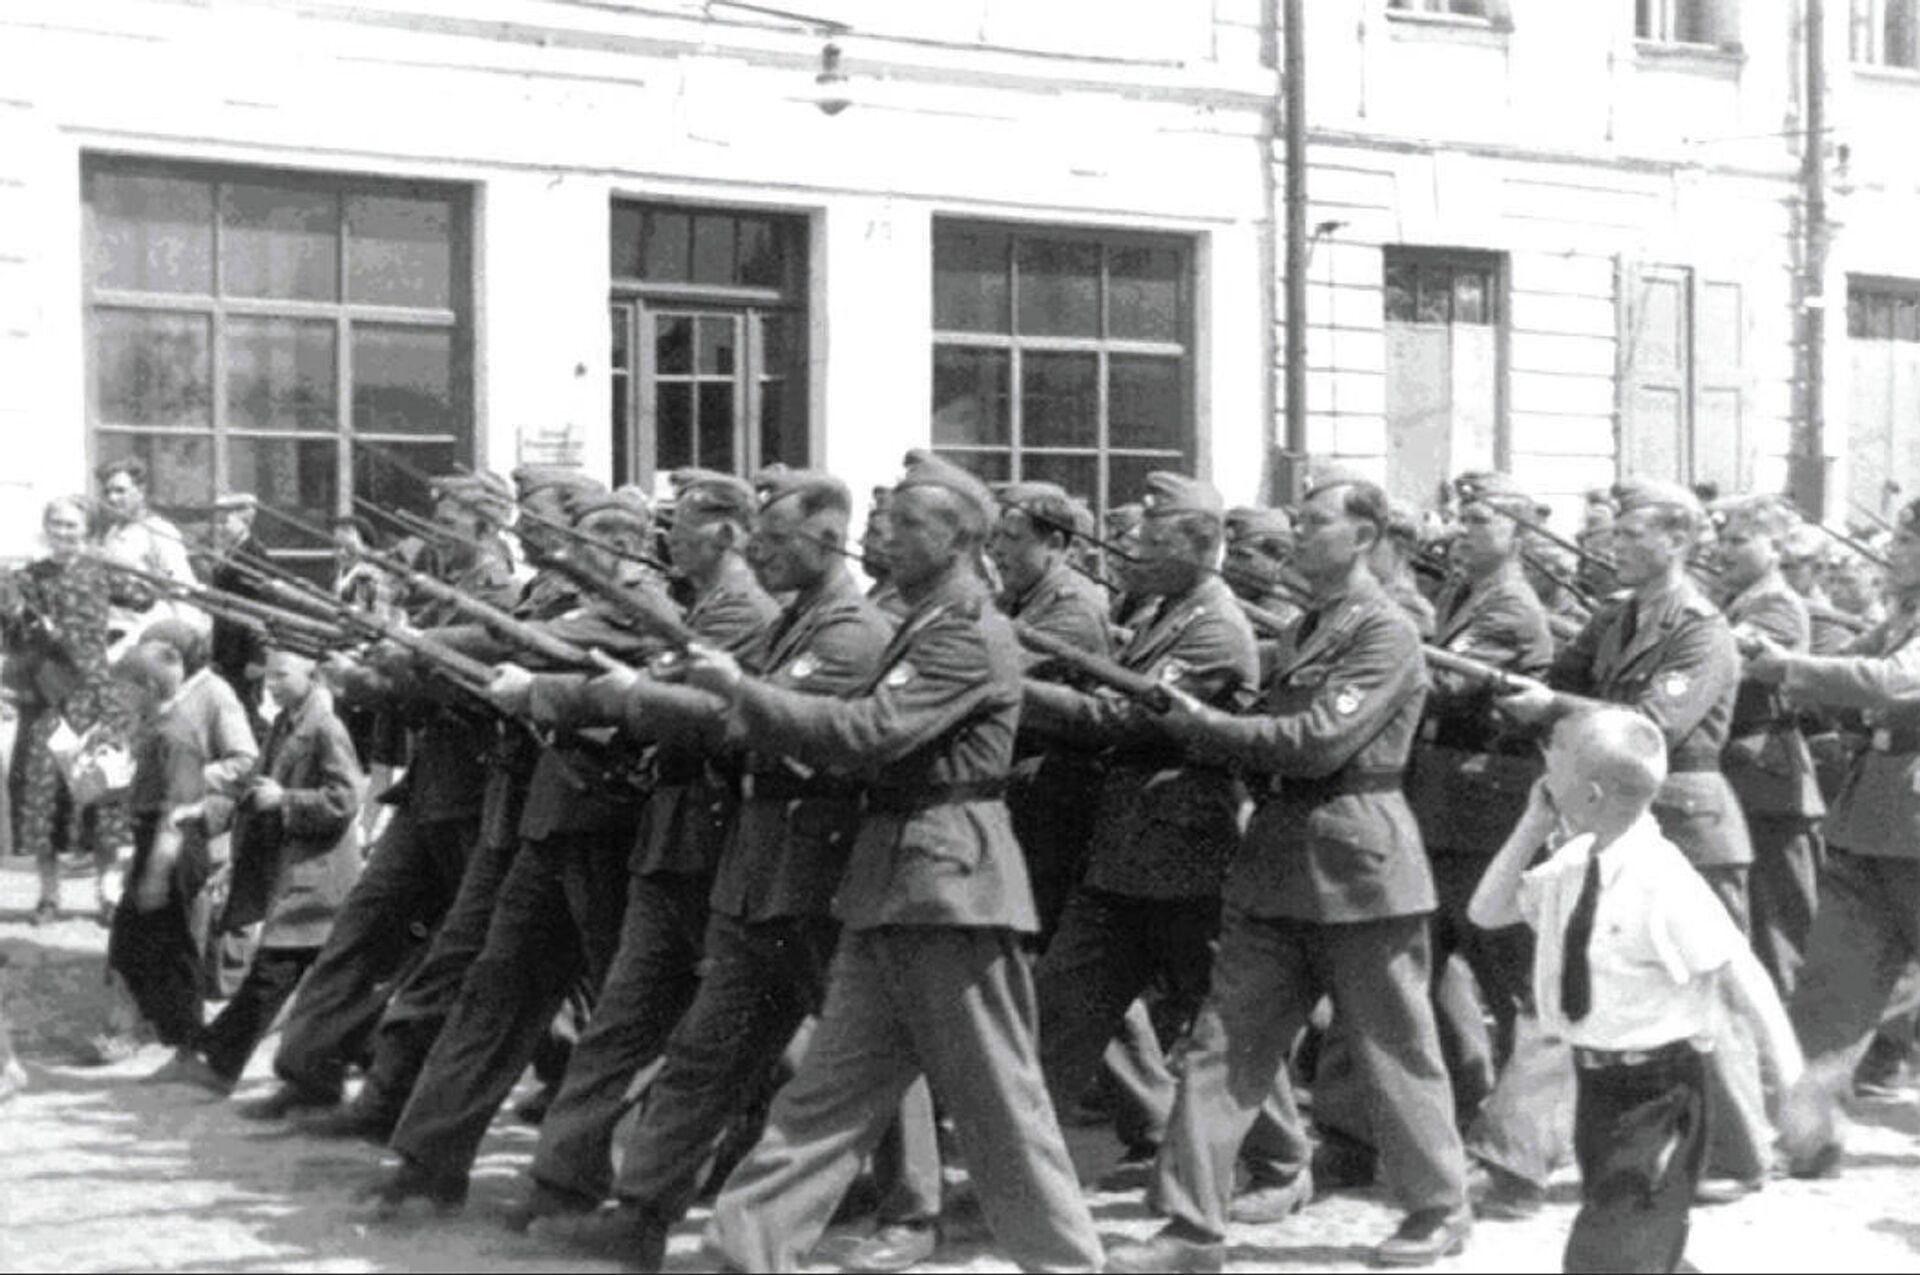 Парад РОА. Псков, 22 июня 1943 года  - РИА Новости, 1920, 04.12.2020